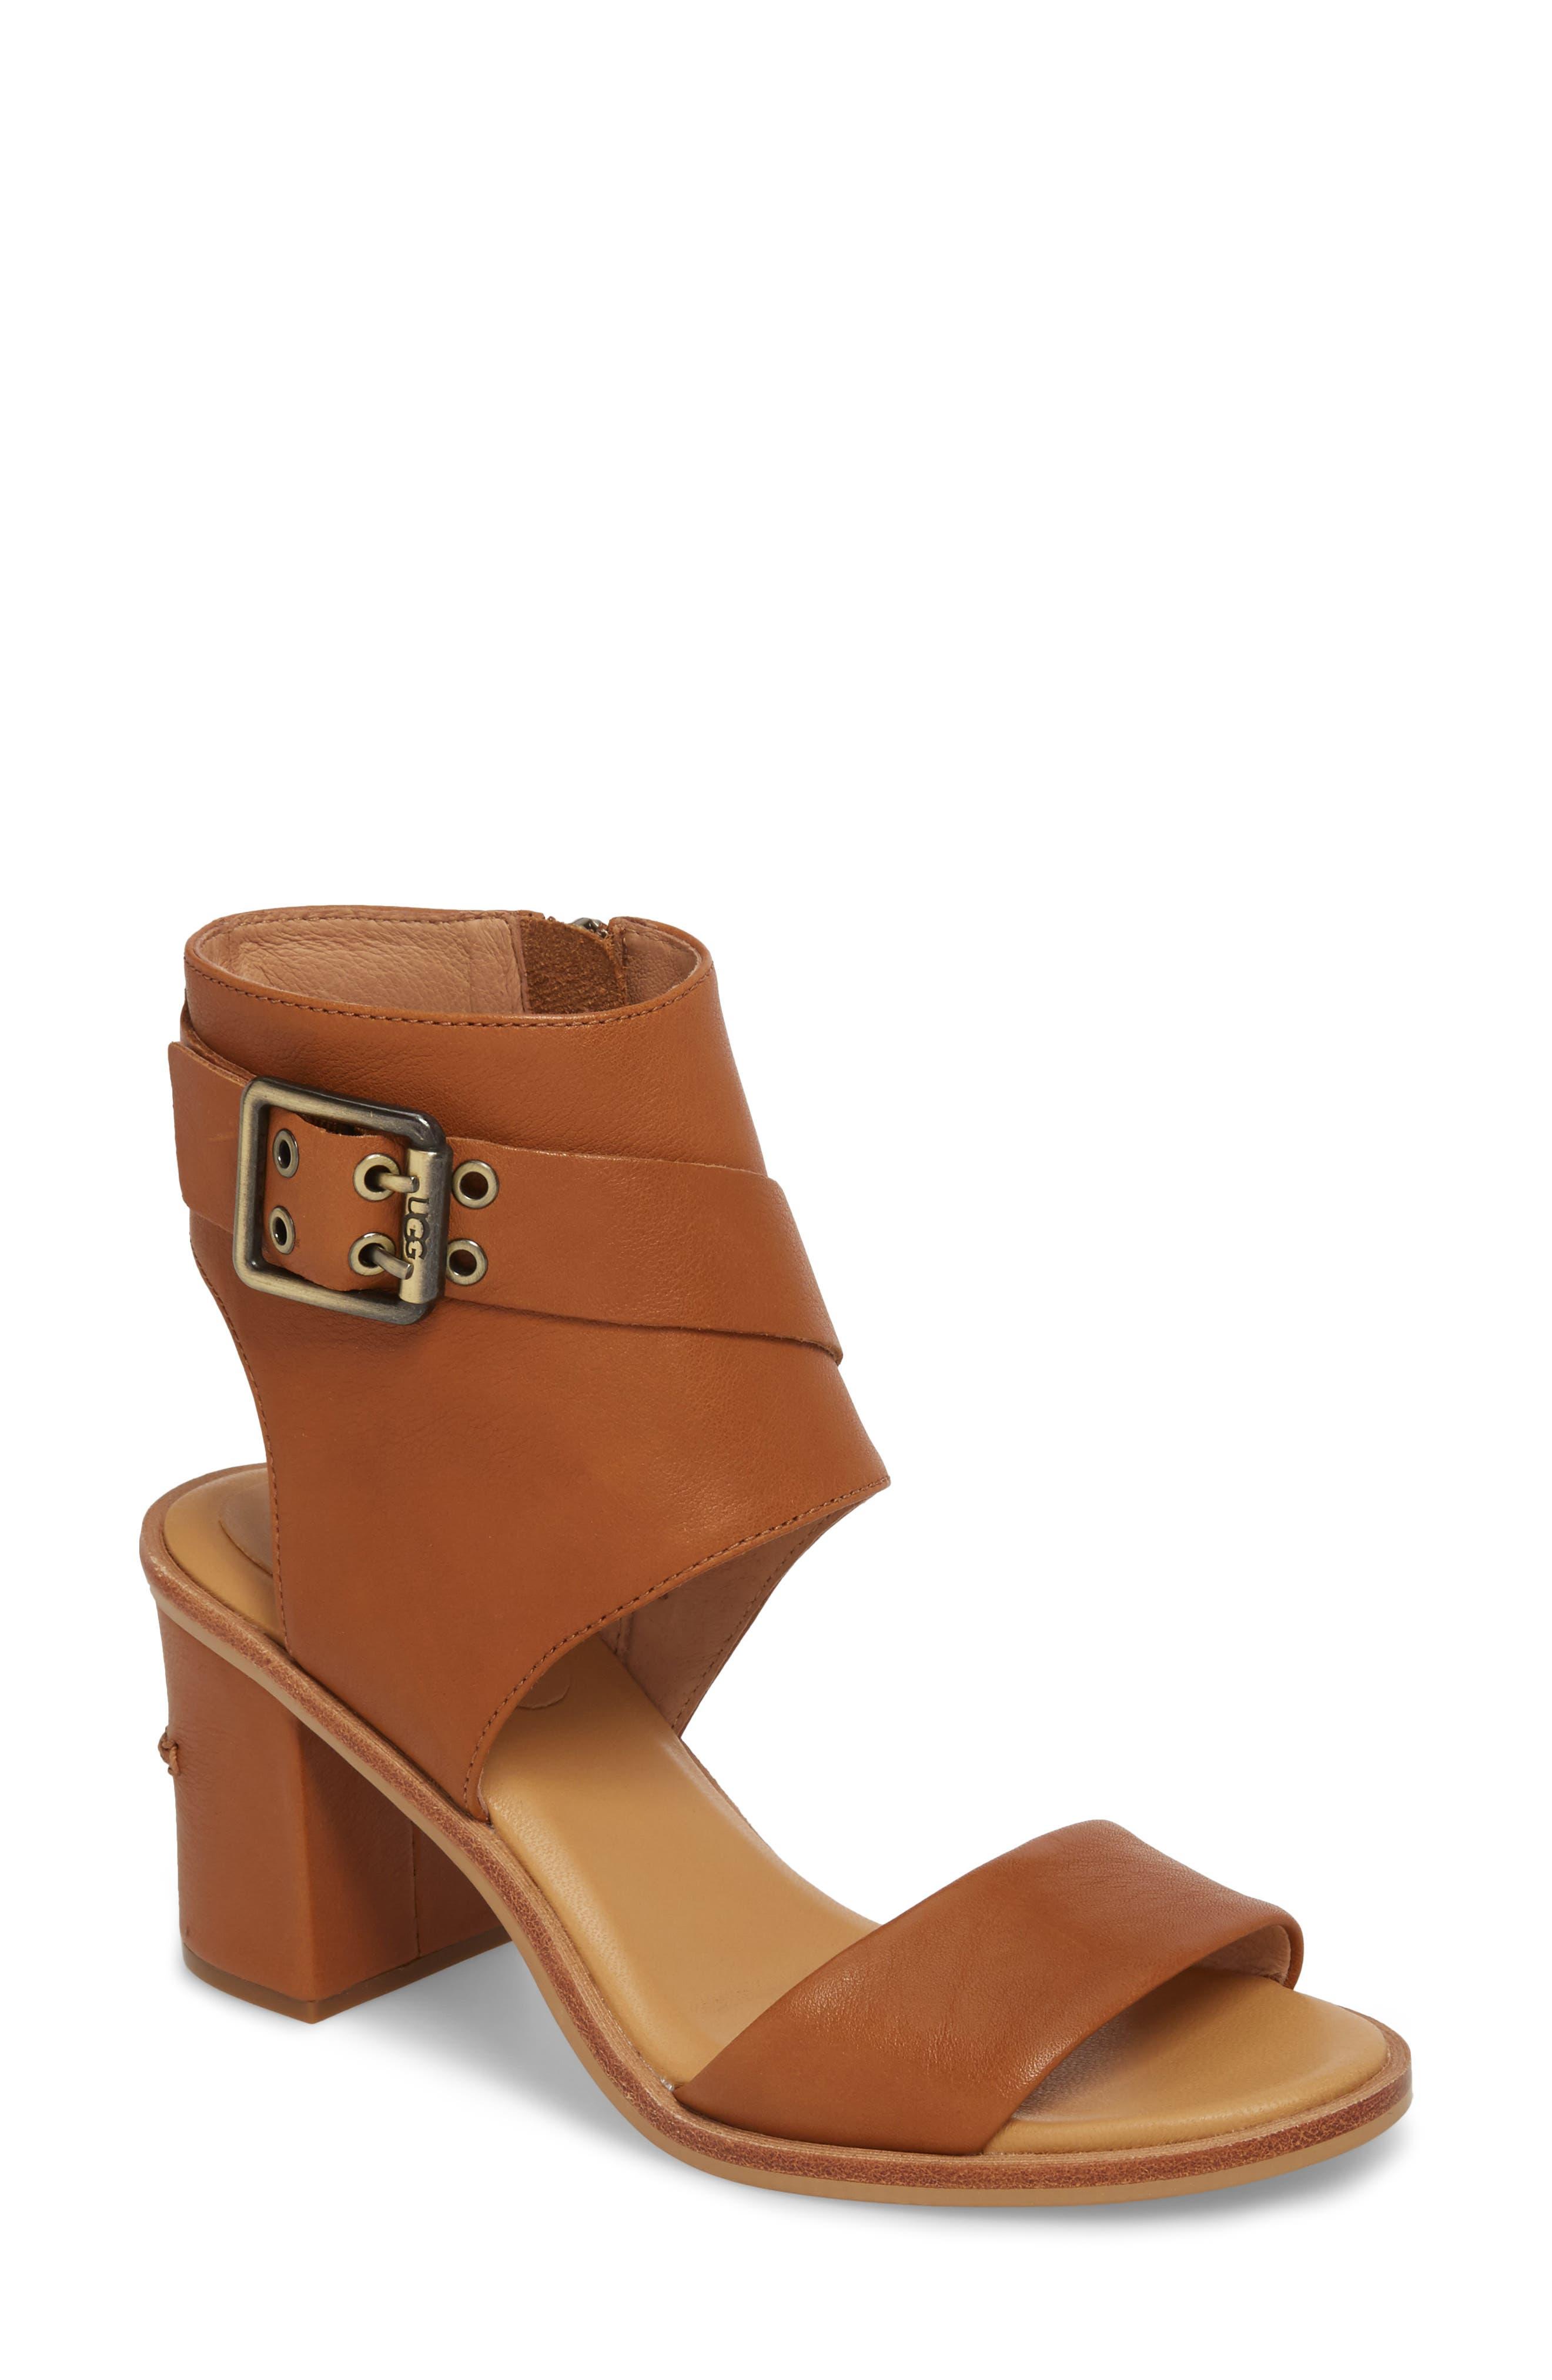 Claudette Cuff Sandal,                         Main,                         color, Almond Leather